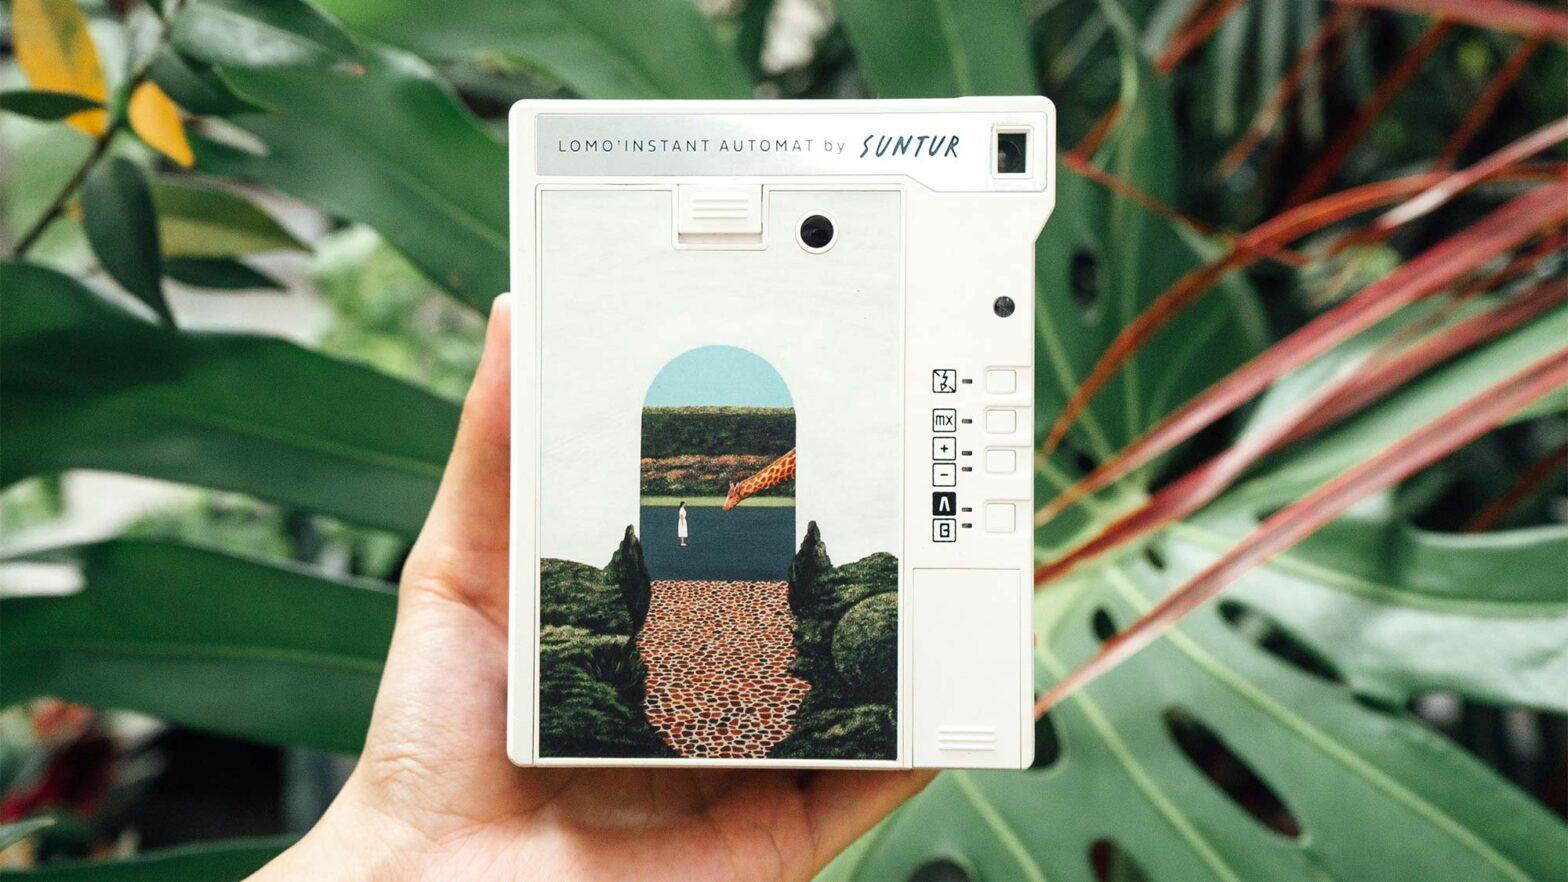 Lomo'Instant Automat Camera and Lenses Suntur Edition